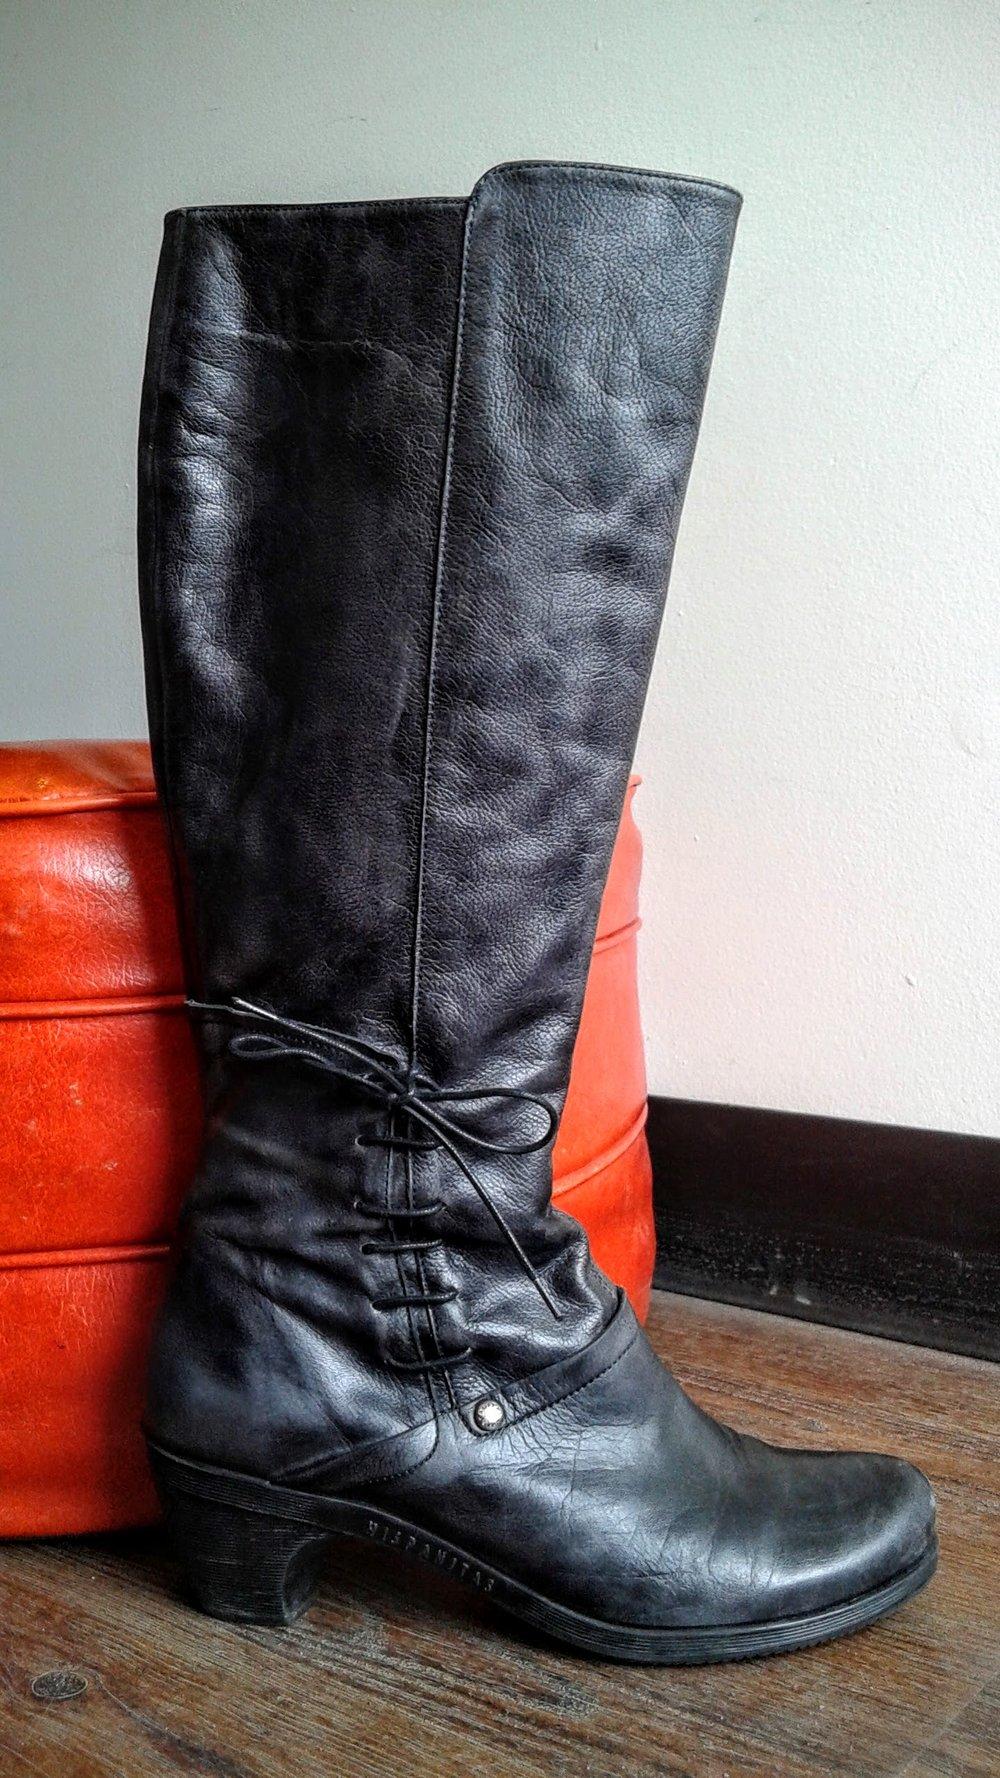 Hispanitas boots, S9, $195